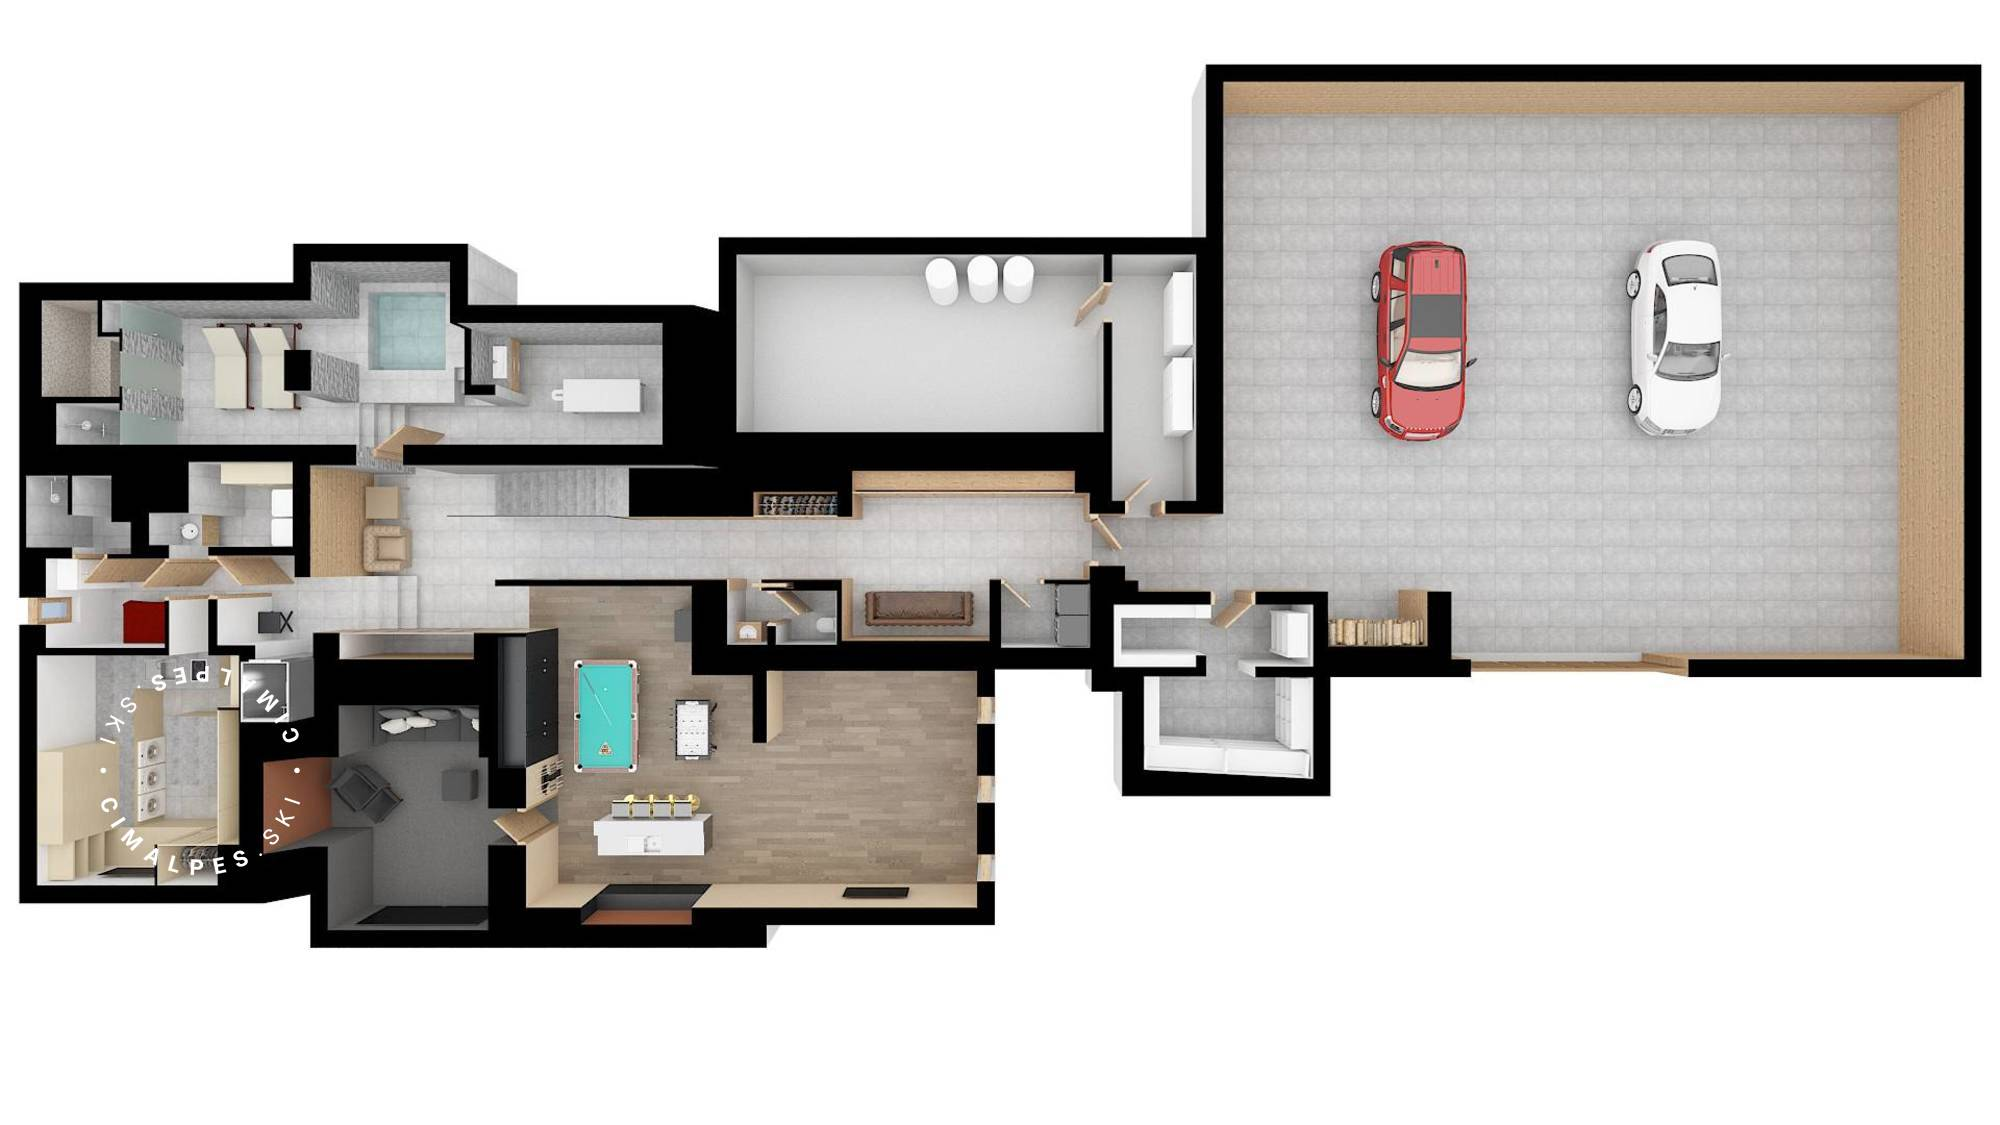 Chalet Des Sens Megeve Floor Plan 2